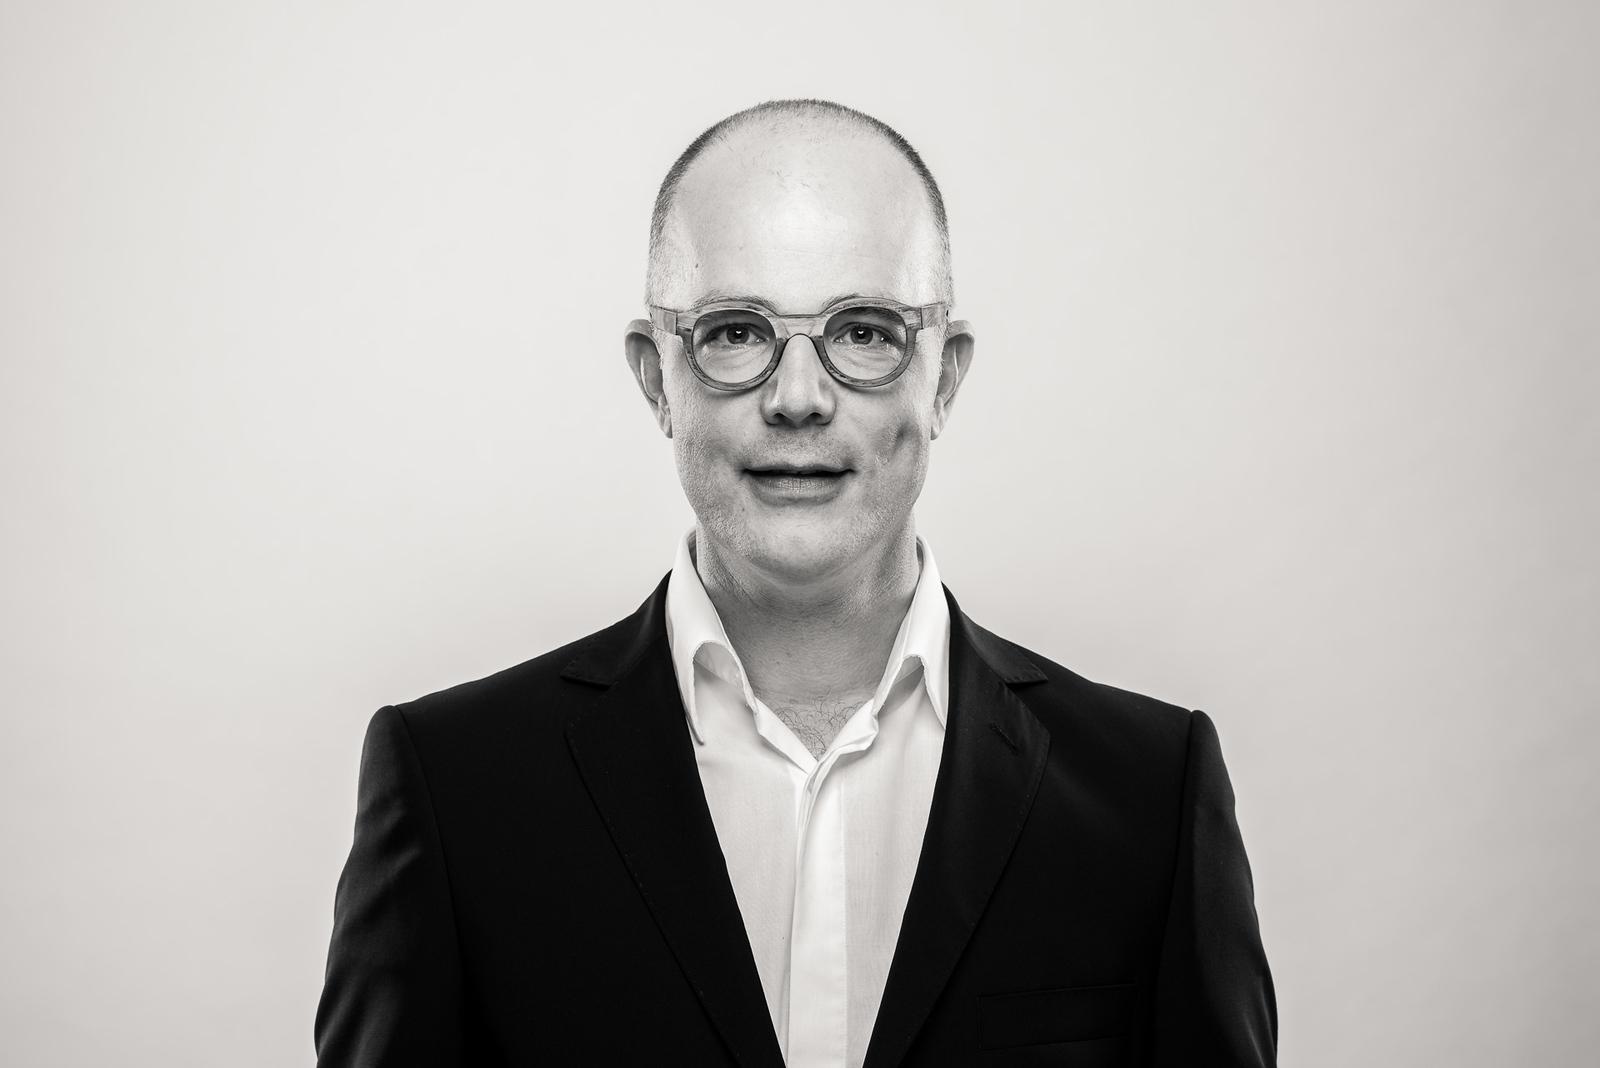 Christoph-Slupetzky-15